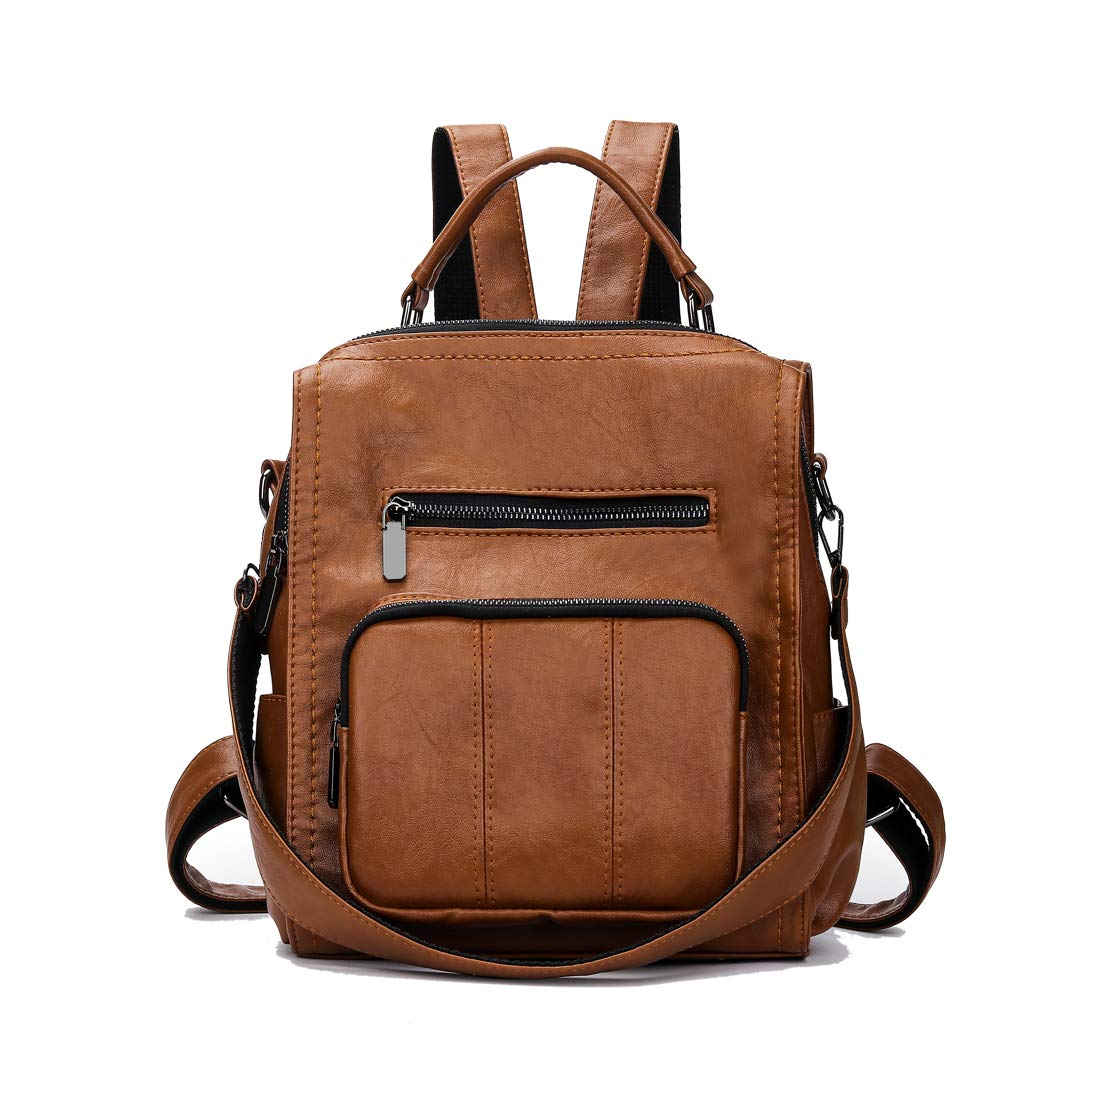 Artwell Women Backpack Purse PU Leather Fashion Shoulder Bag Ladies Rucksack Travel Daypack